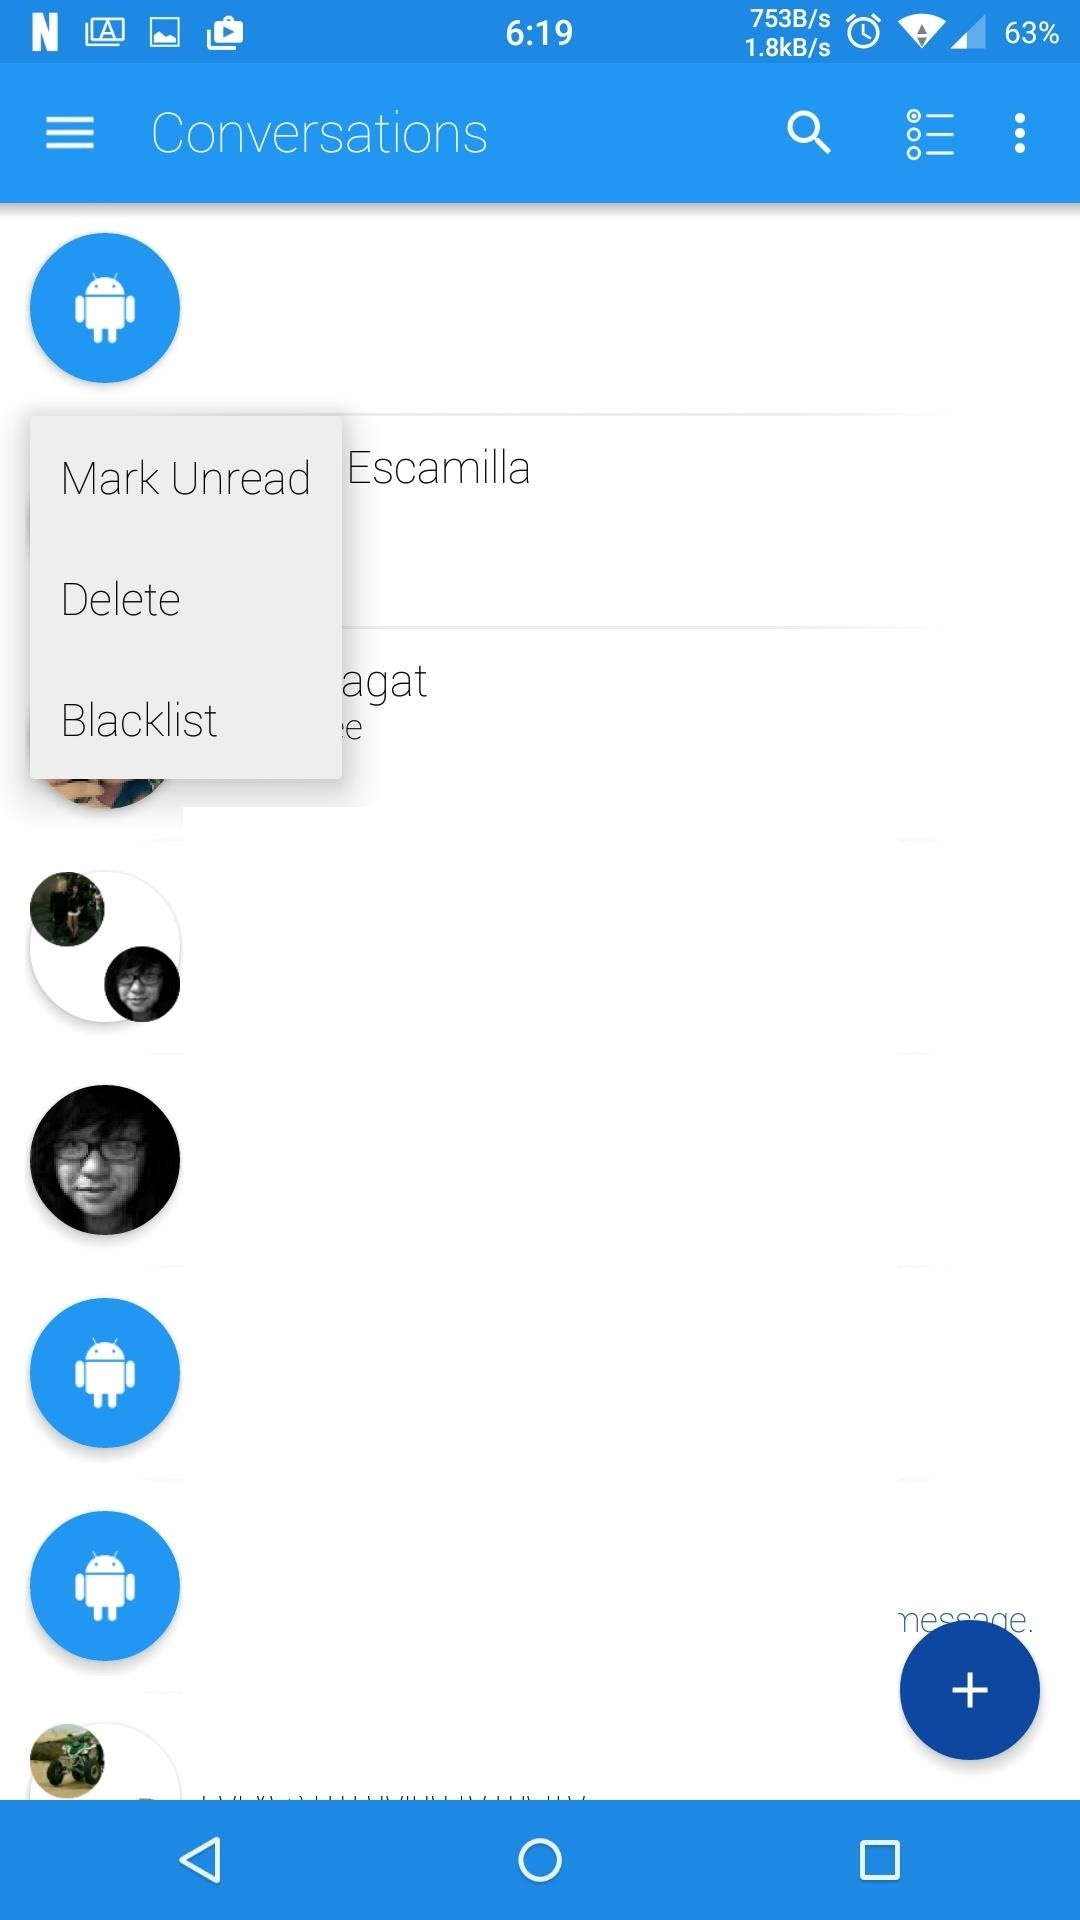 android lollipop stock messaging app